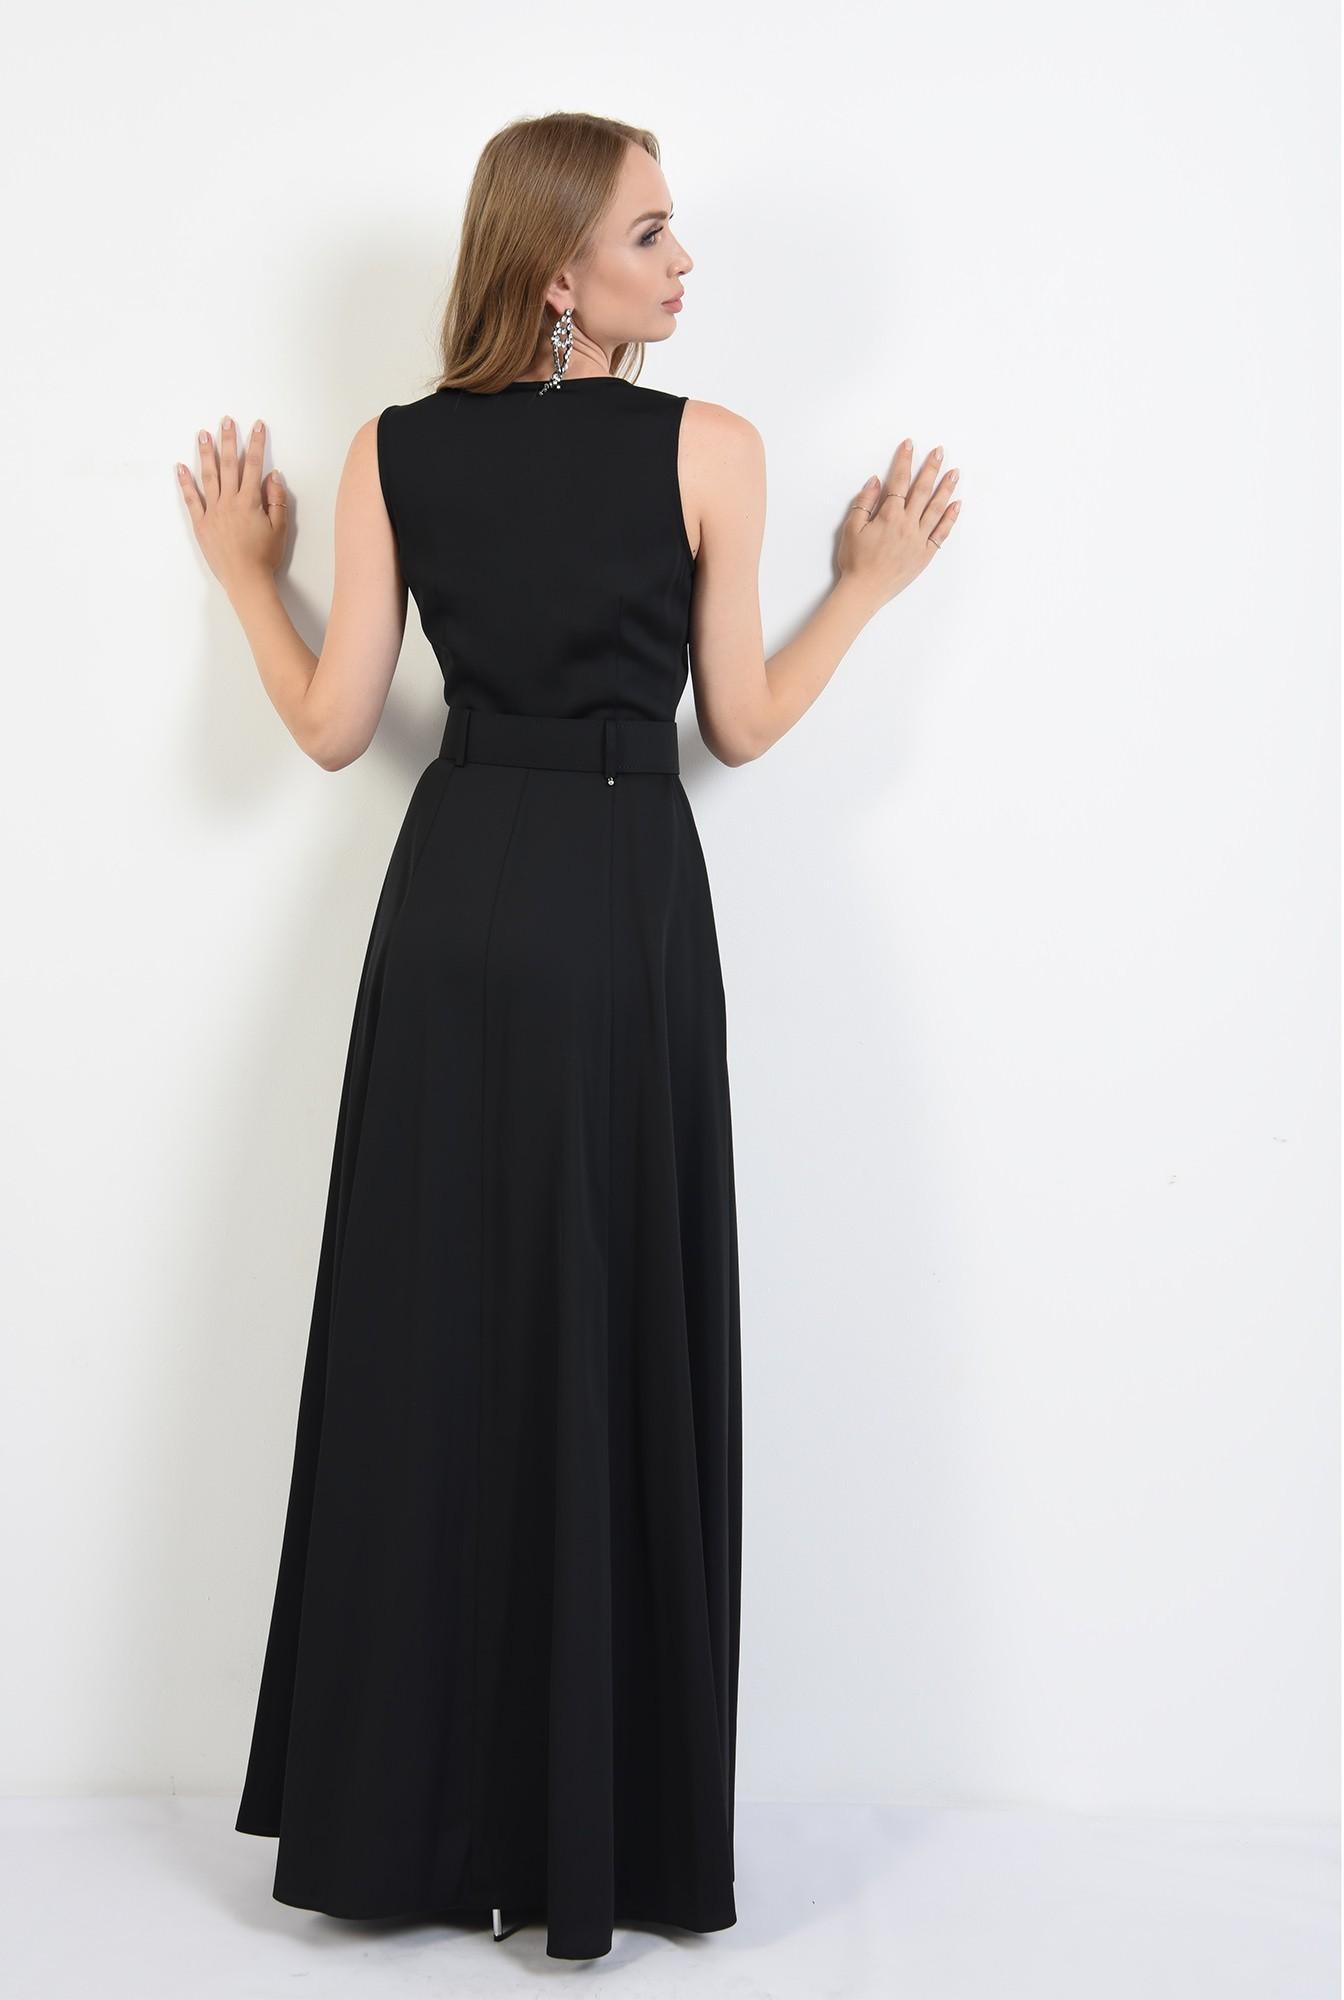 2 - 360 - rochie lunga, neagra, cu centura, Poema